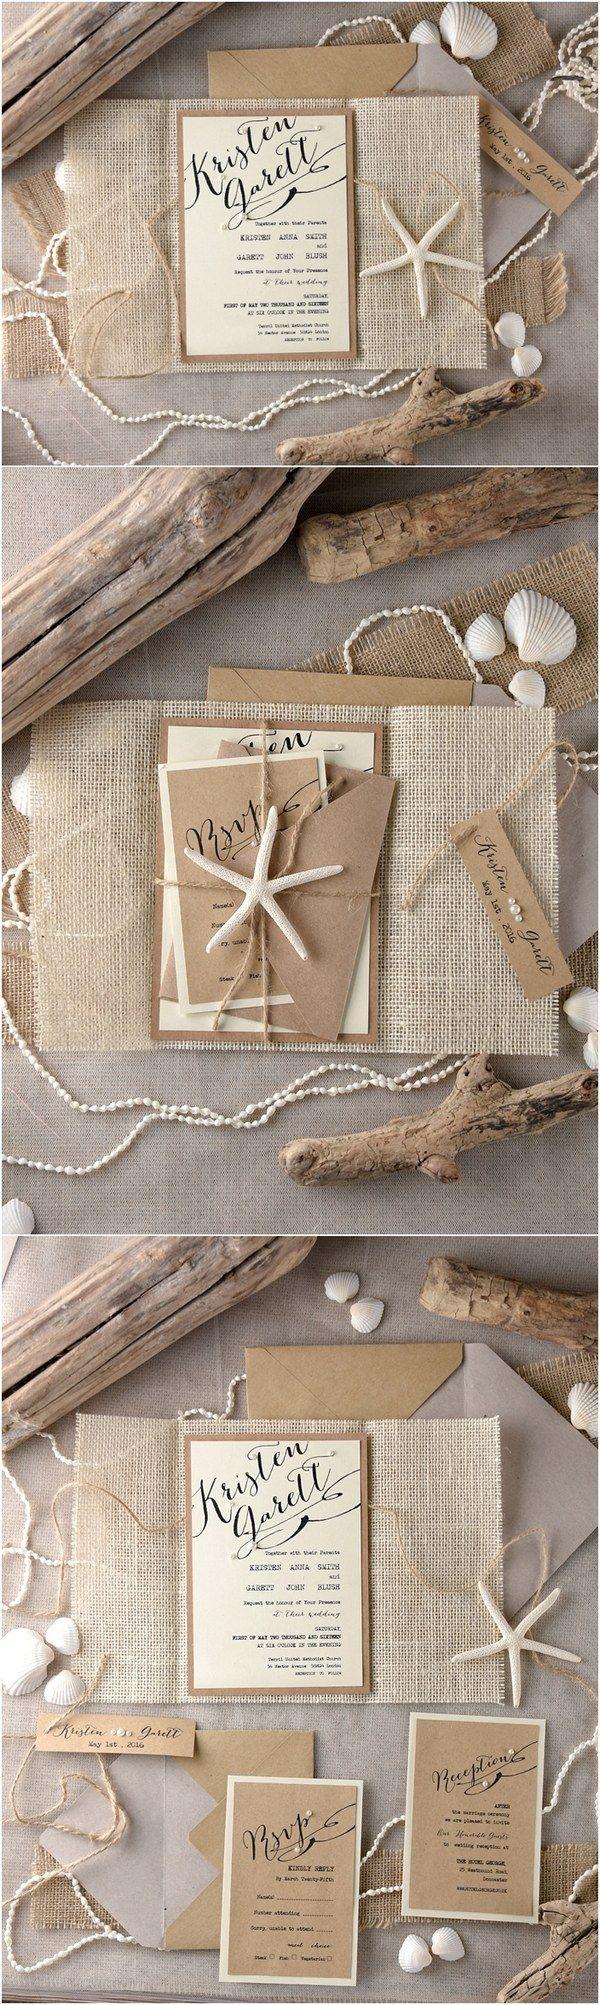 beach invitations beach wedding invitations Rustic country burlap beach wedding invitations 4LOVEPolkaDots